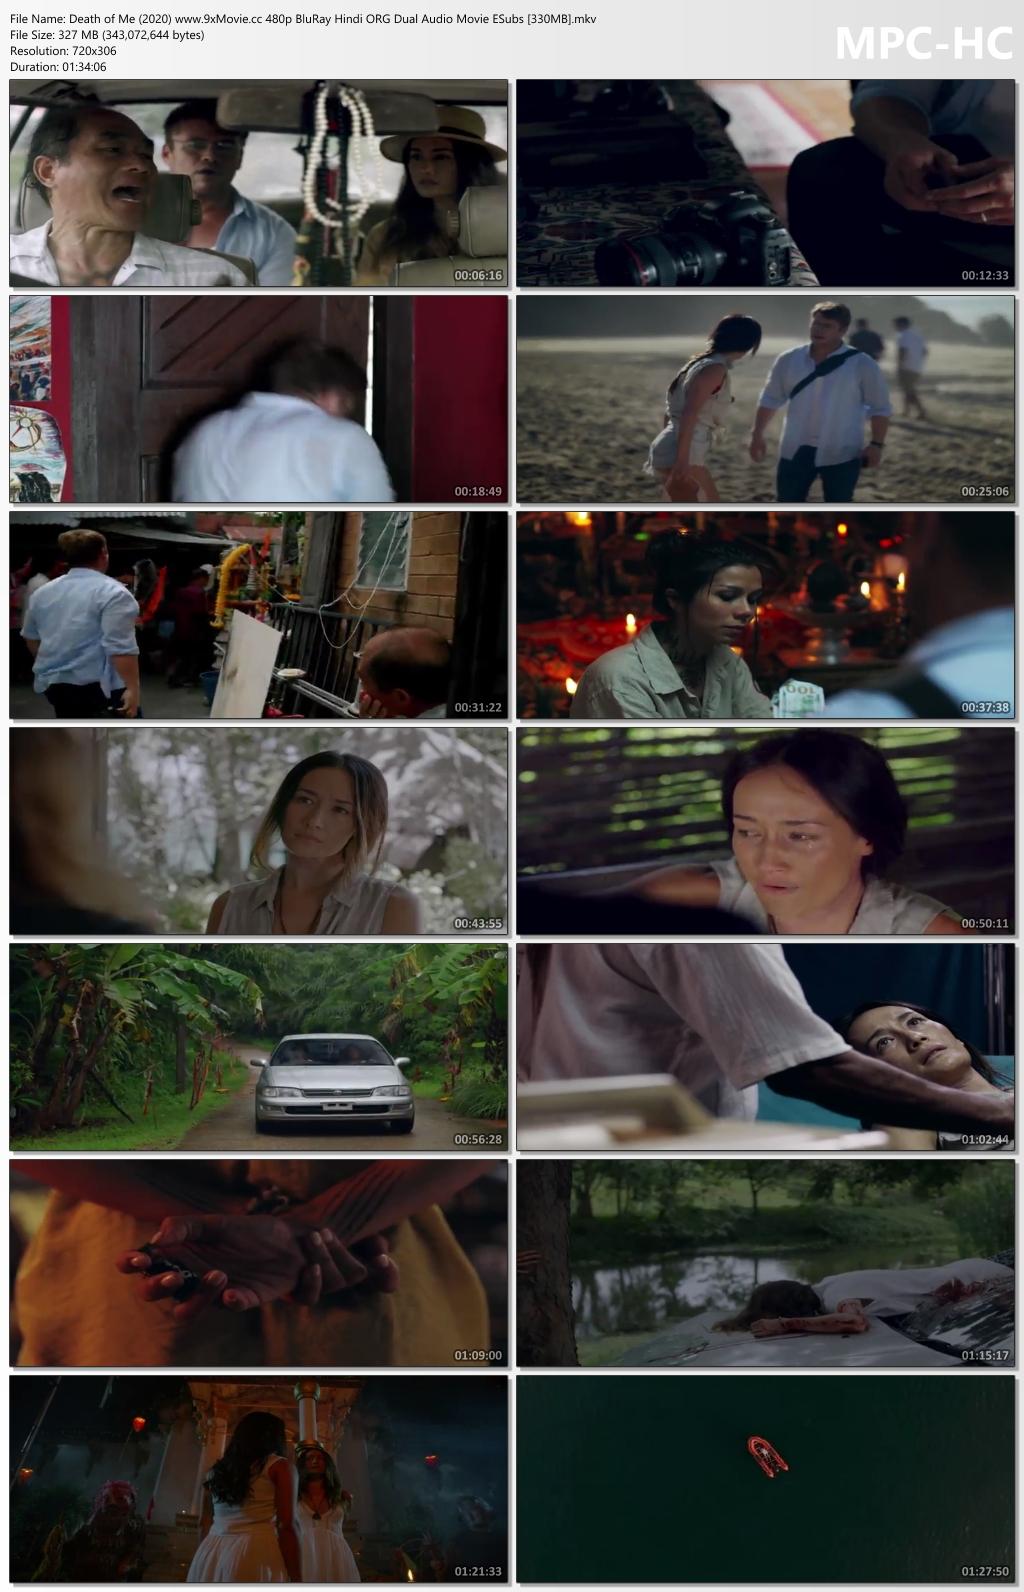 Death-of-Me-2020-www-9x-Movie-cc-480p-Blu-Ray-Hindi-ORG-Dual-Audio-Movie-ESubs-330-MB-mkv